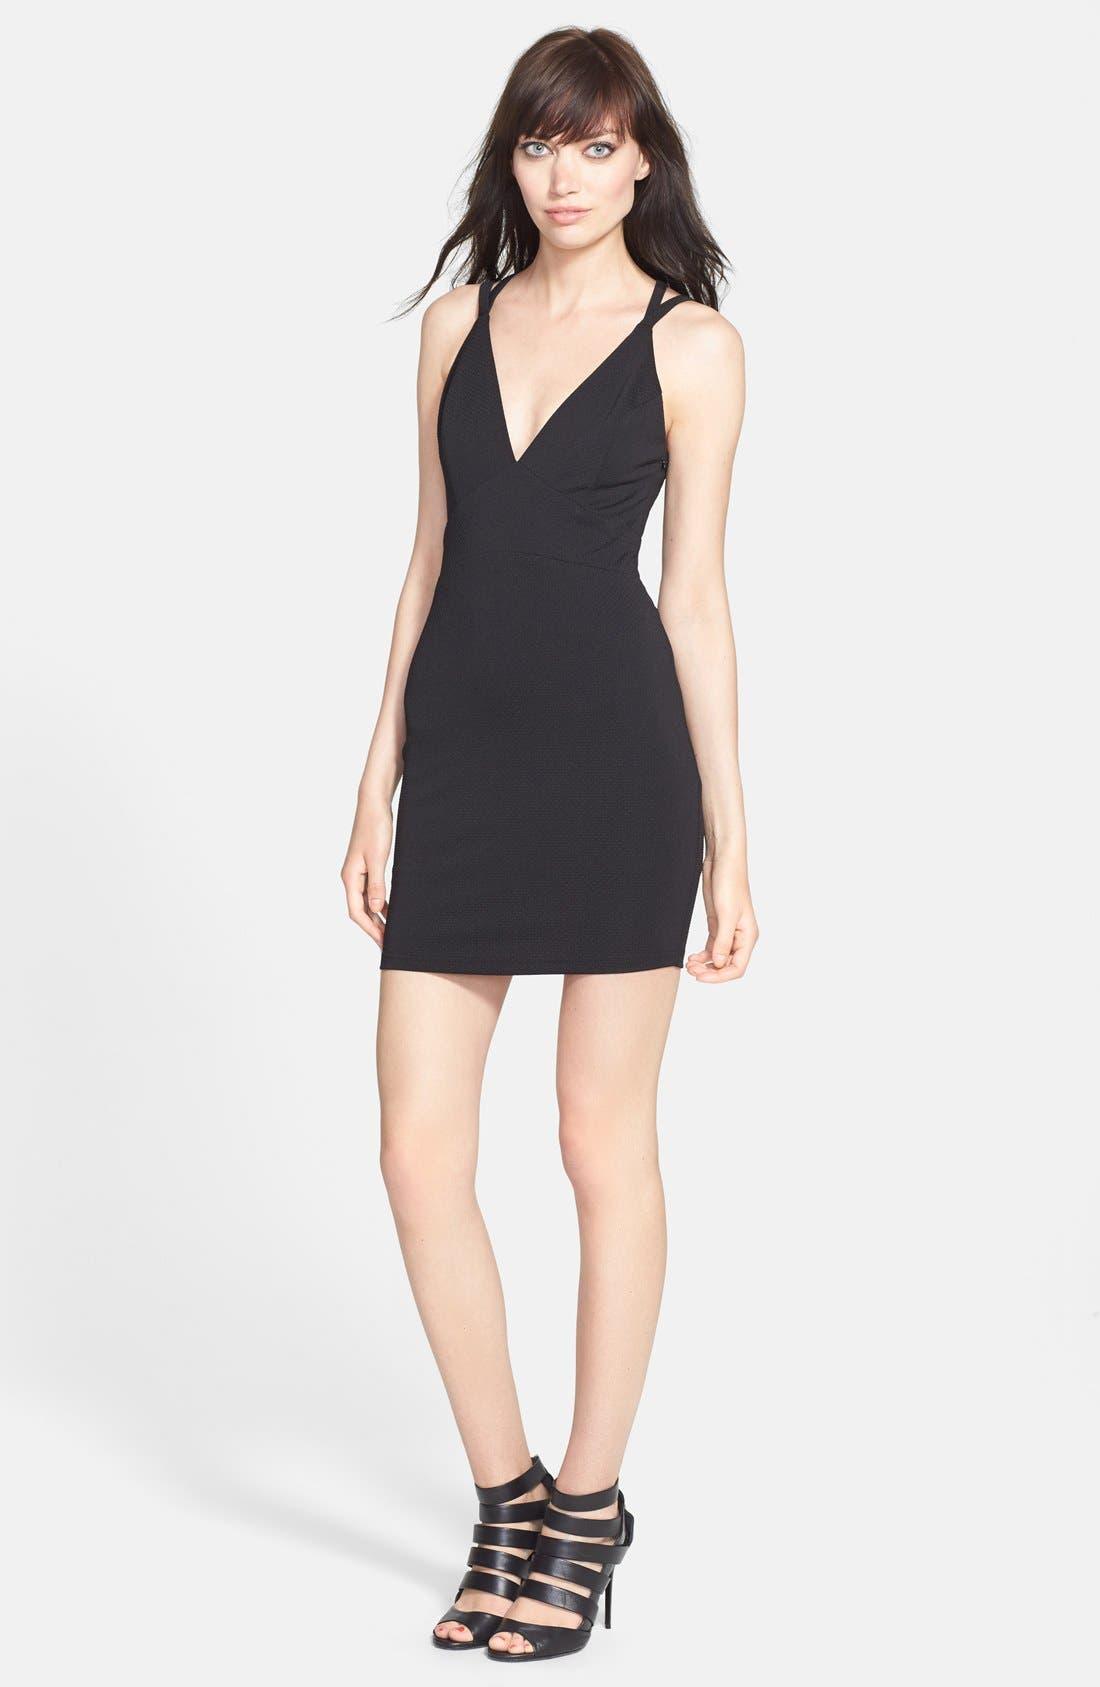 Main Image - ASTR Textured Body-Con Dress